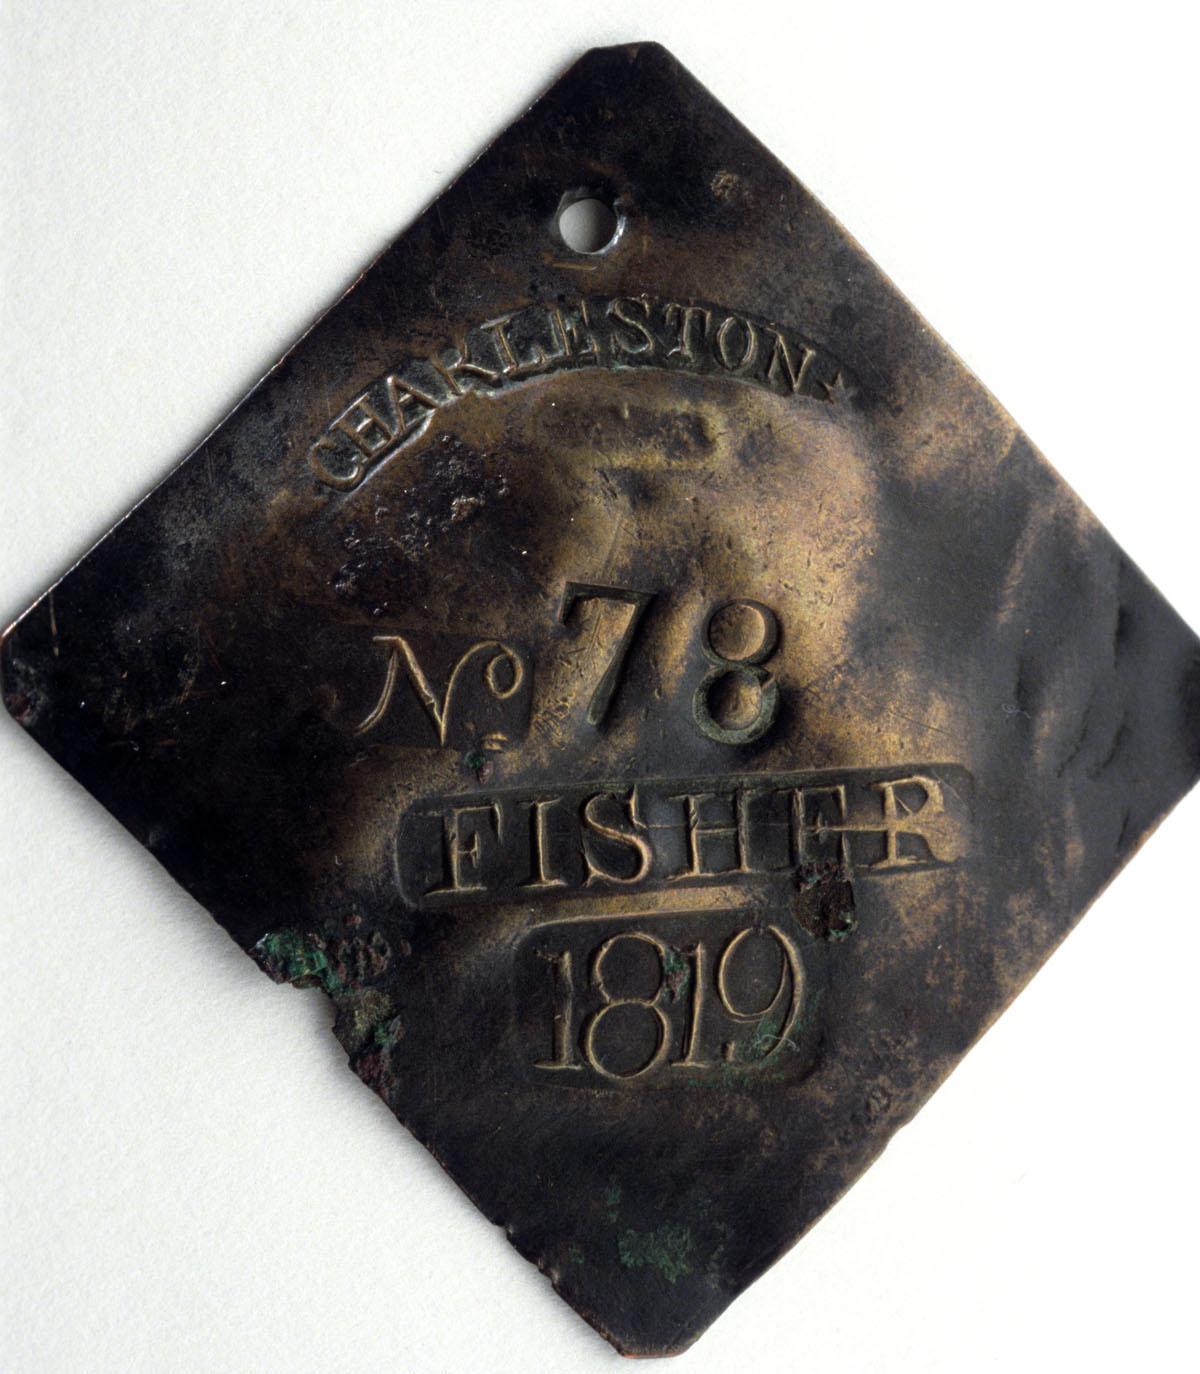 1977.0152